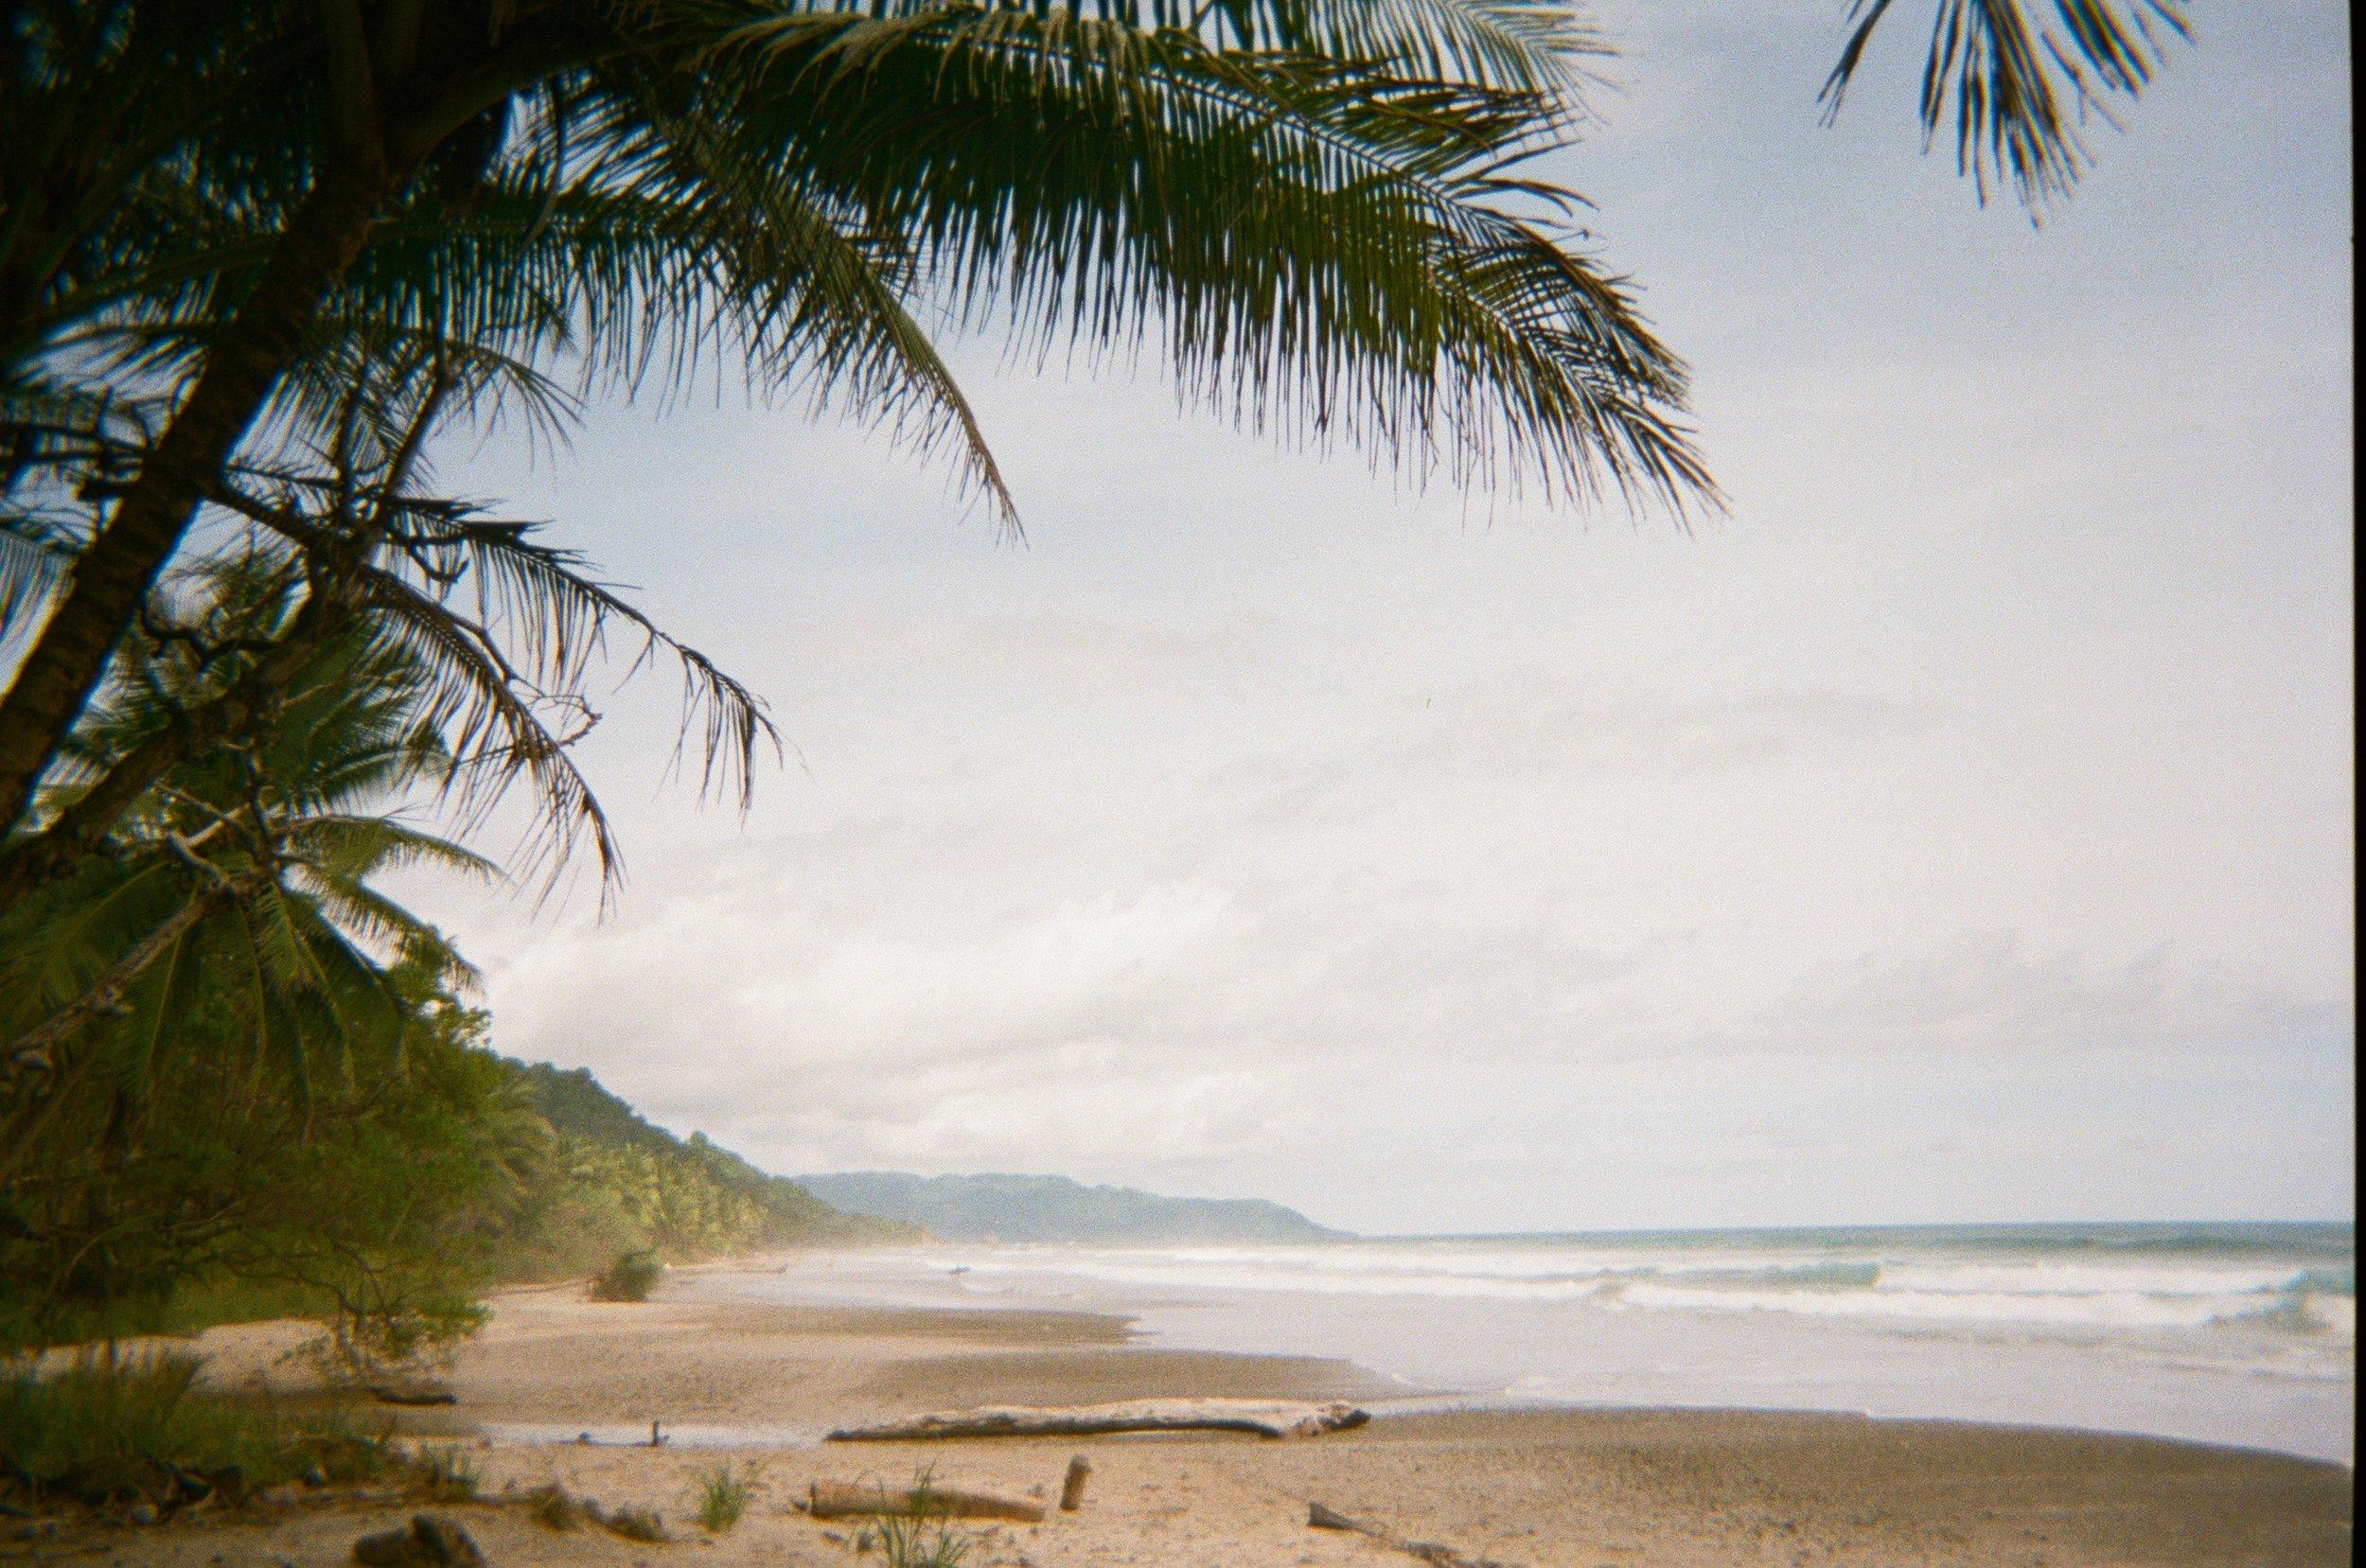 Stormy Costa Rica